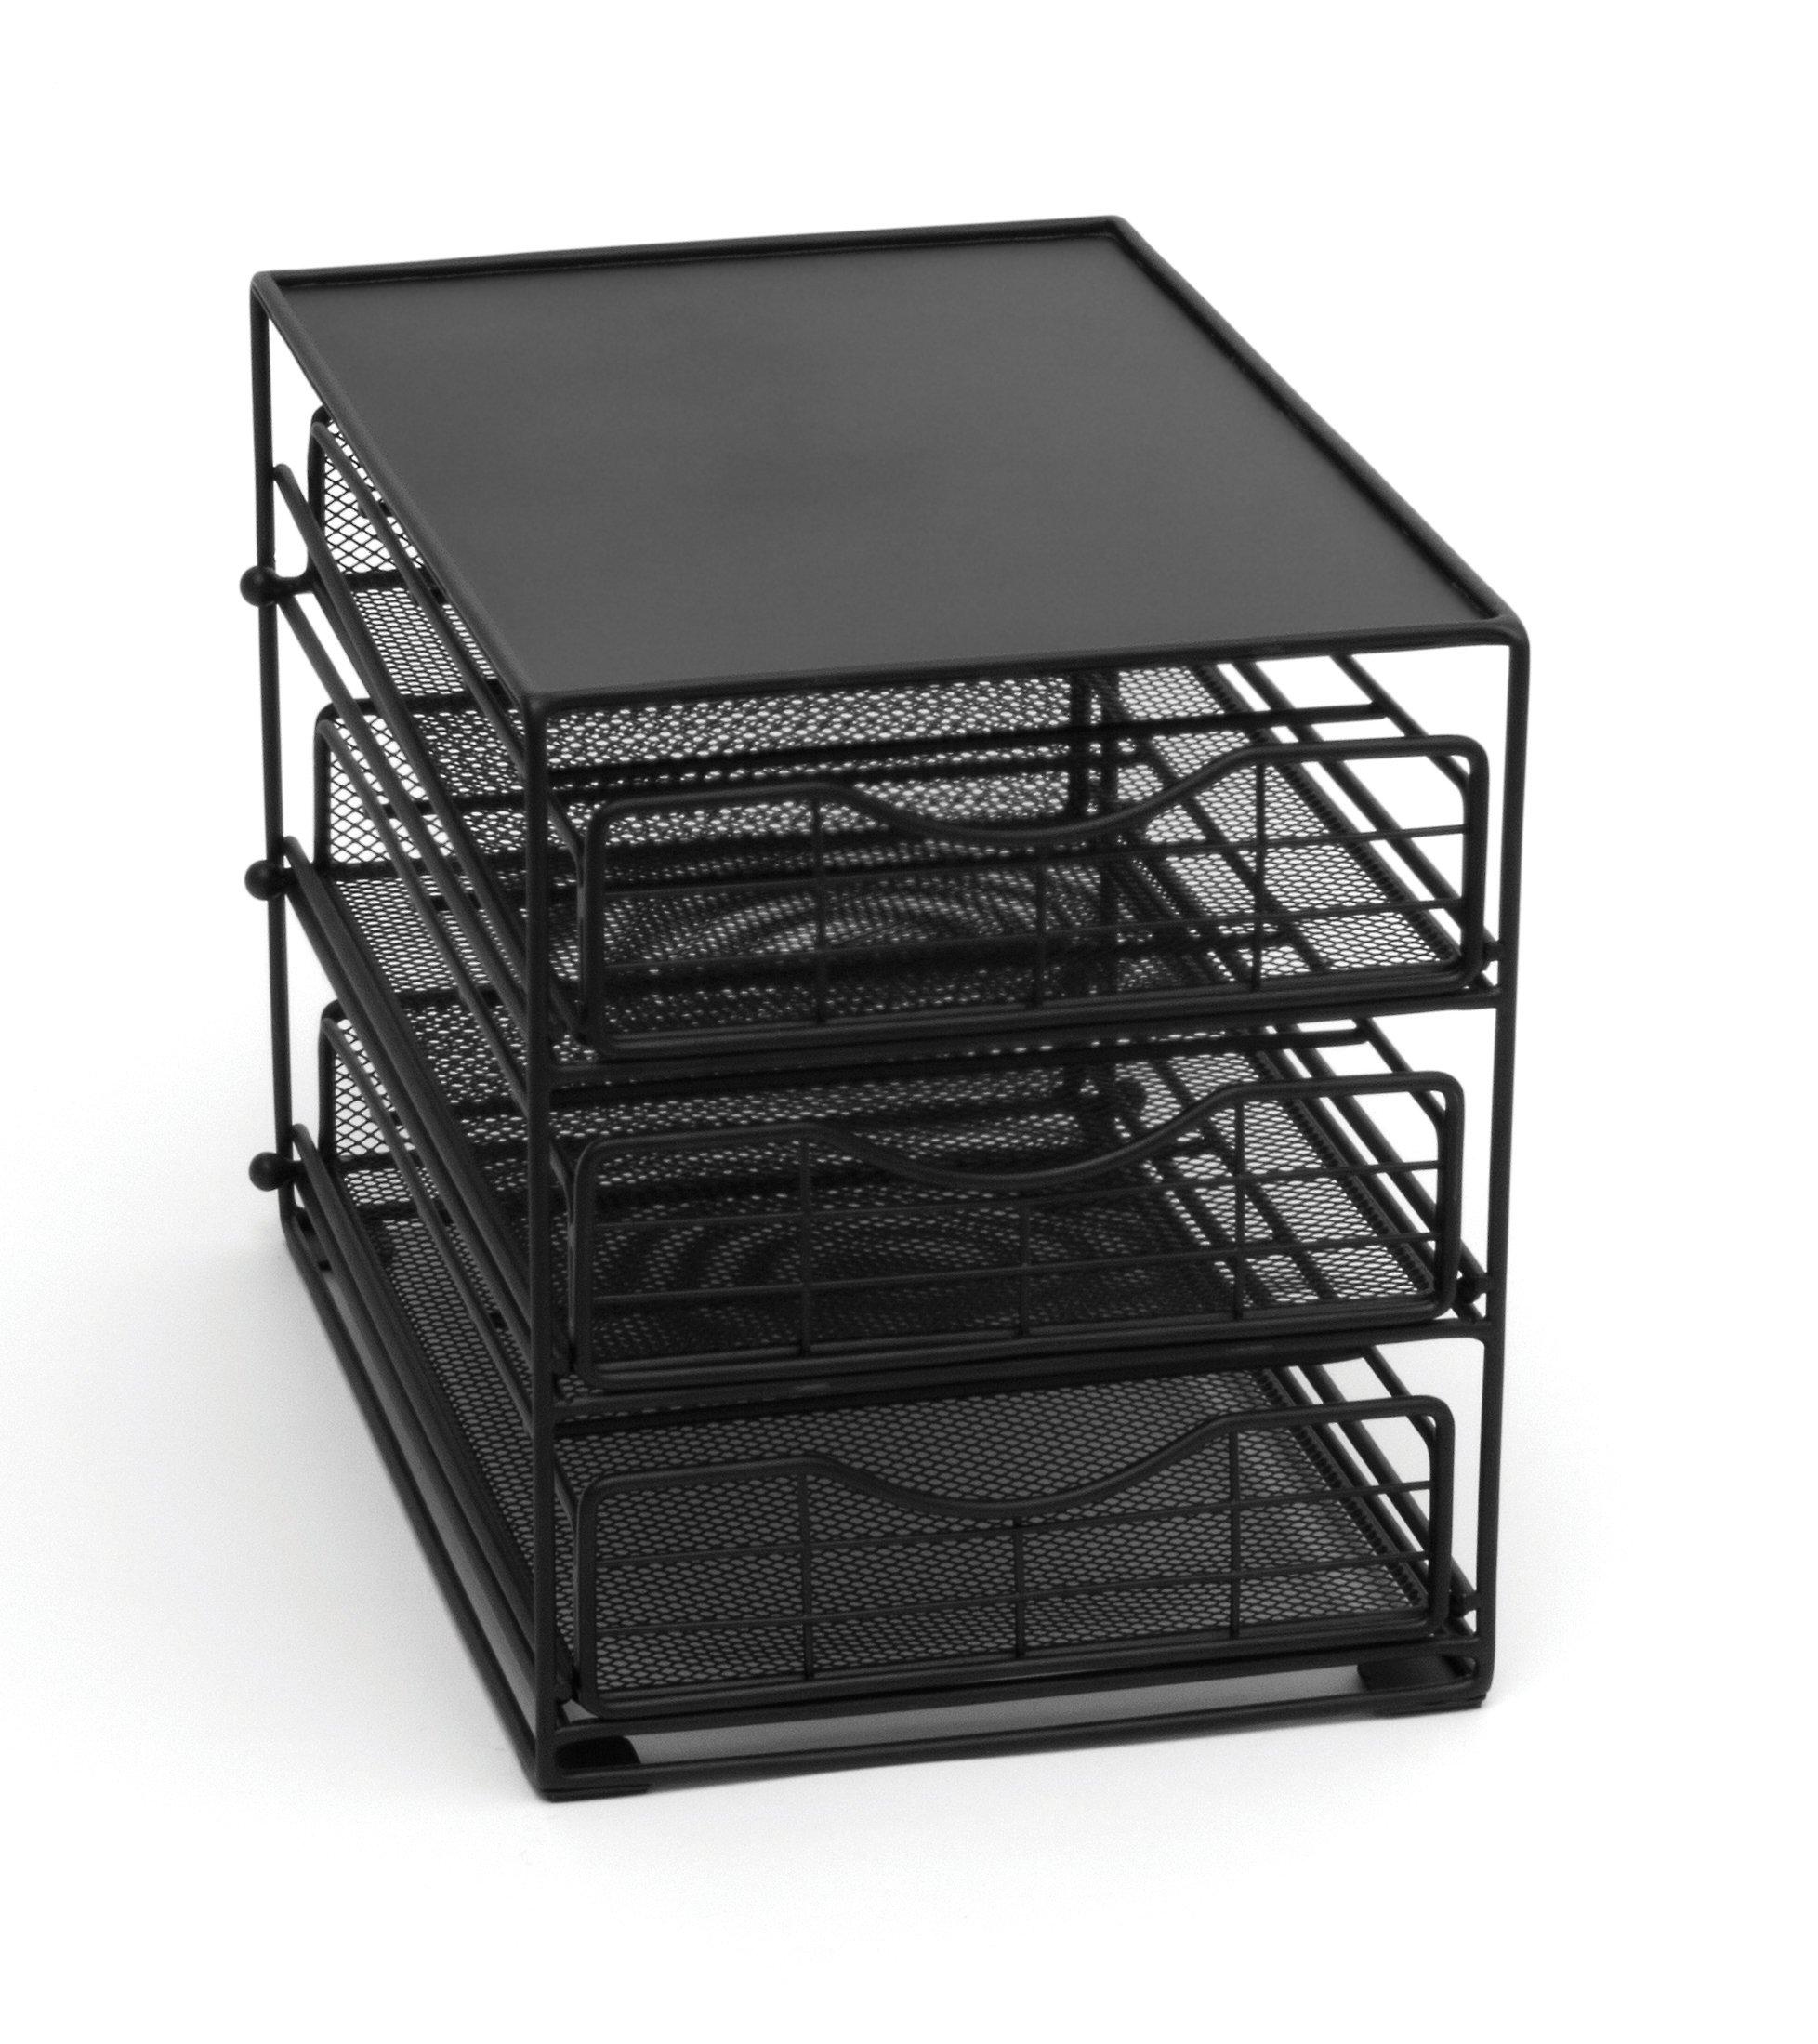 Lipper International 8670 In-Cabinet Coffee Pod Drawer, 3-Tier, 45-Pod Capacity, Black by Lipper International